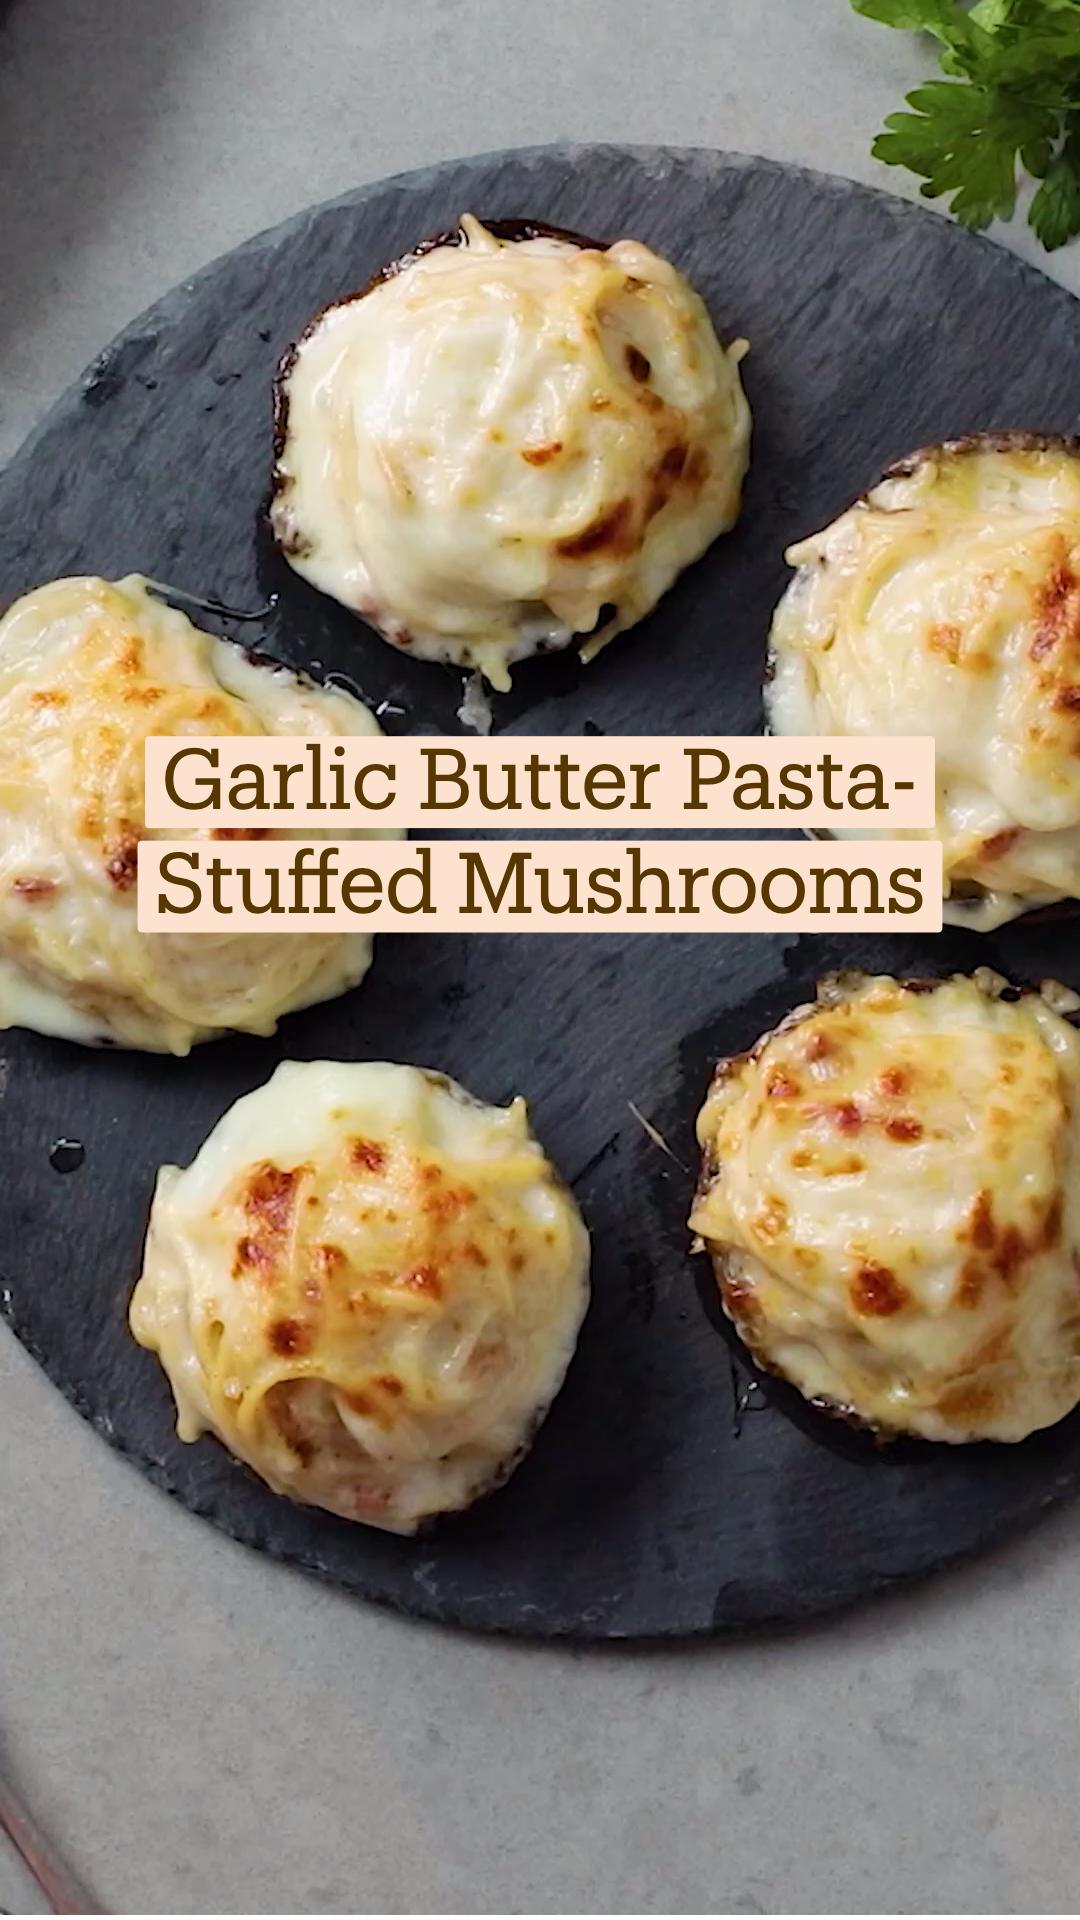 Garlic Butter Pasta-Stuffed Mushrooms